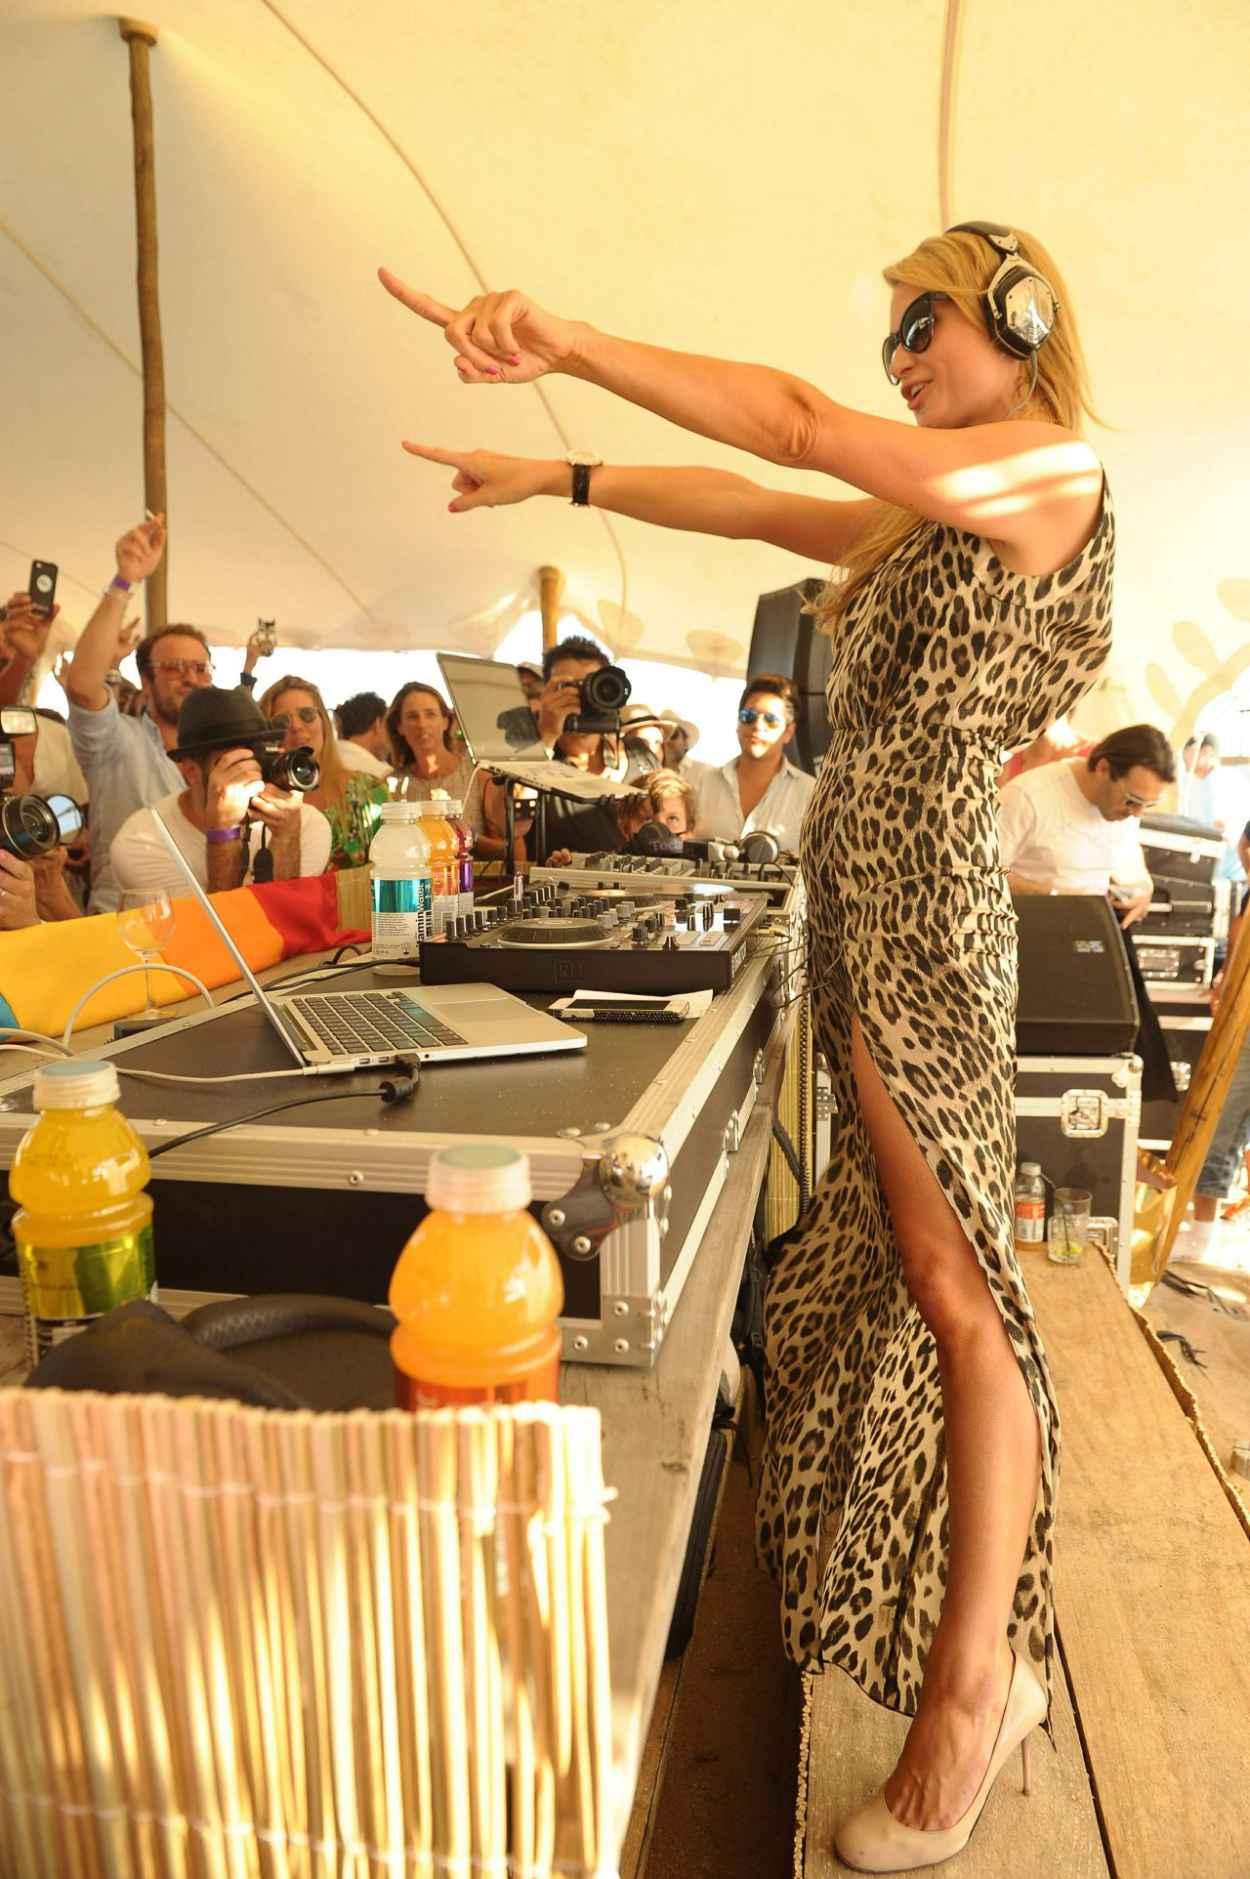 Paris Hilton at Vitaminwater Party - Restaurant La Colacola in Uruguay - January 2015-1